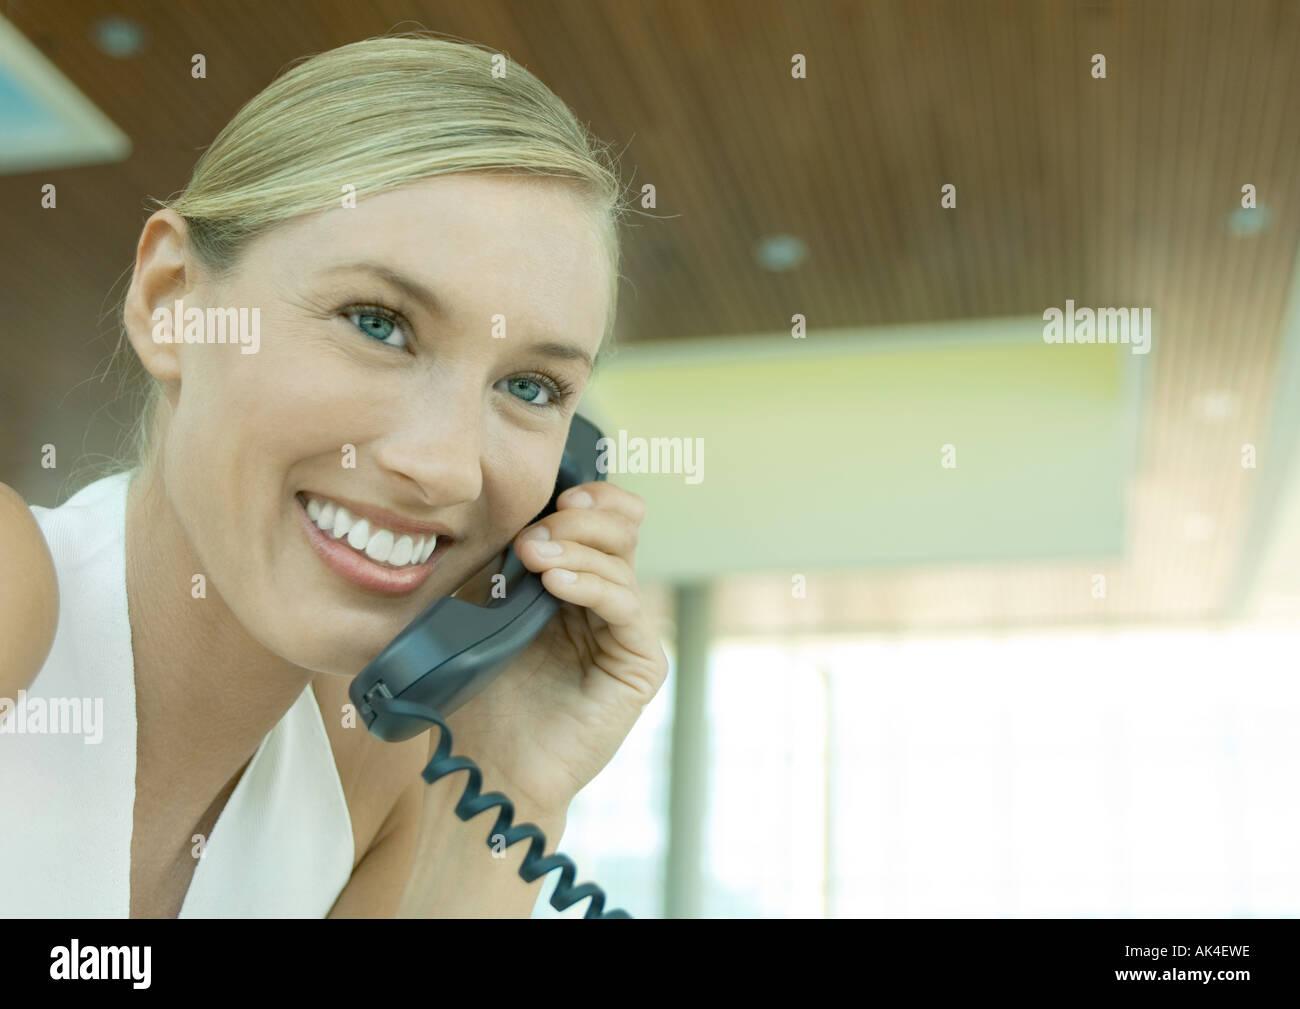 Woman using telephone - Stock Image